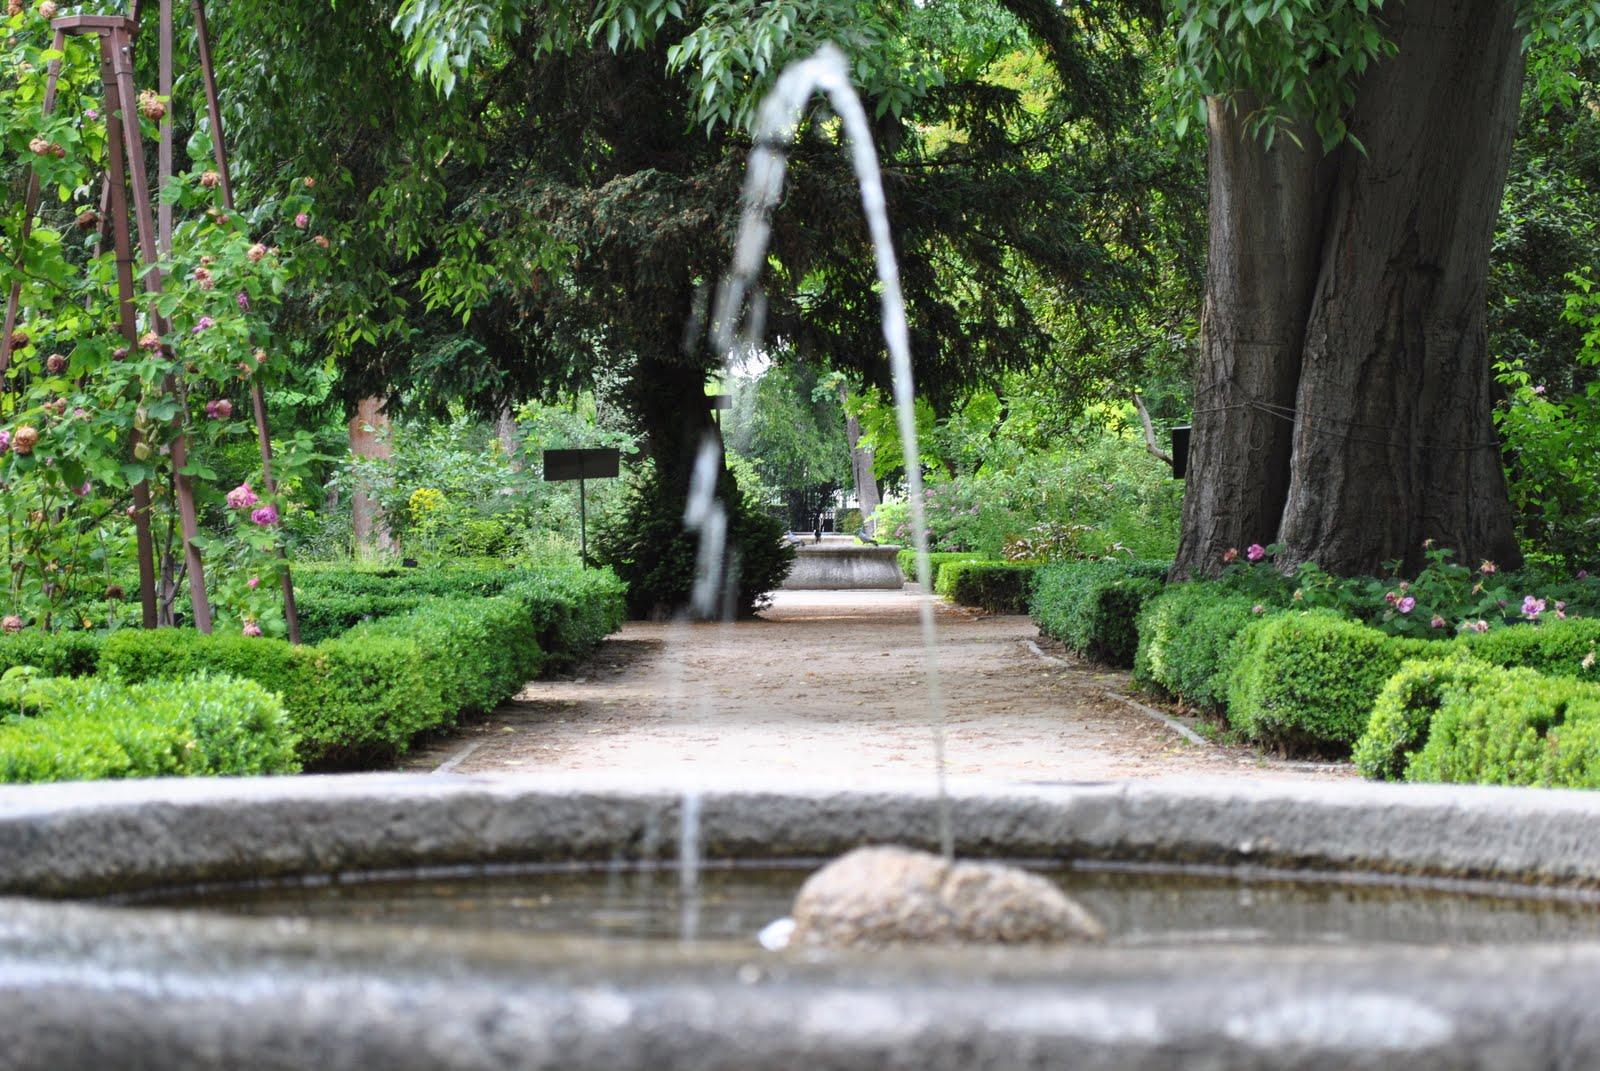 Andar como burro sin mecate el real jard n bot nico for Jardin botanico el ejido